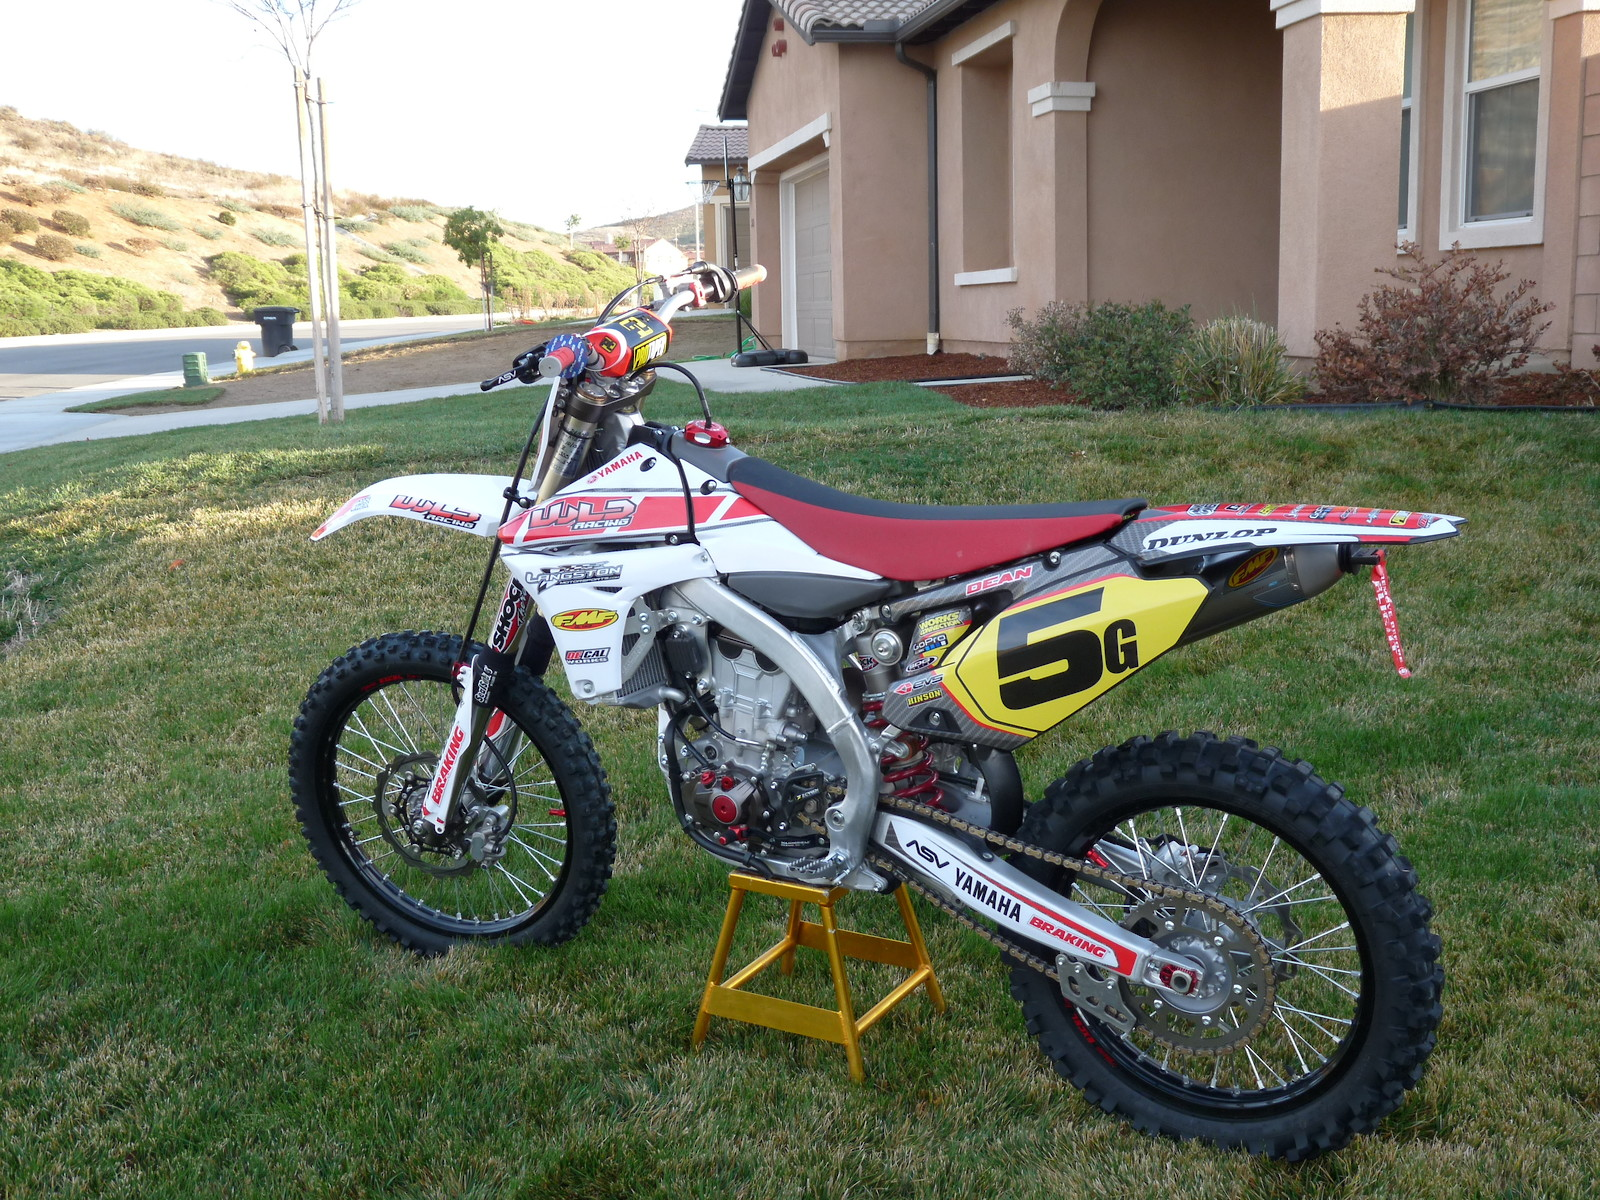 P1230518 - WLD - Motocross Pictures - Vital MX